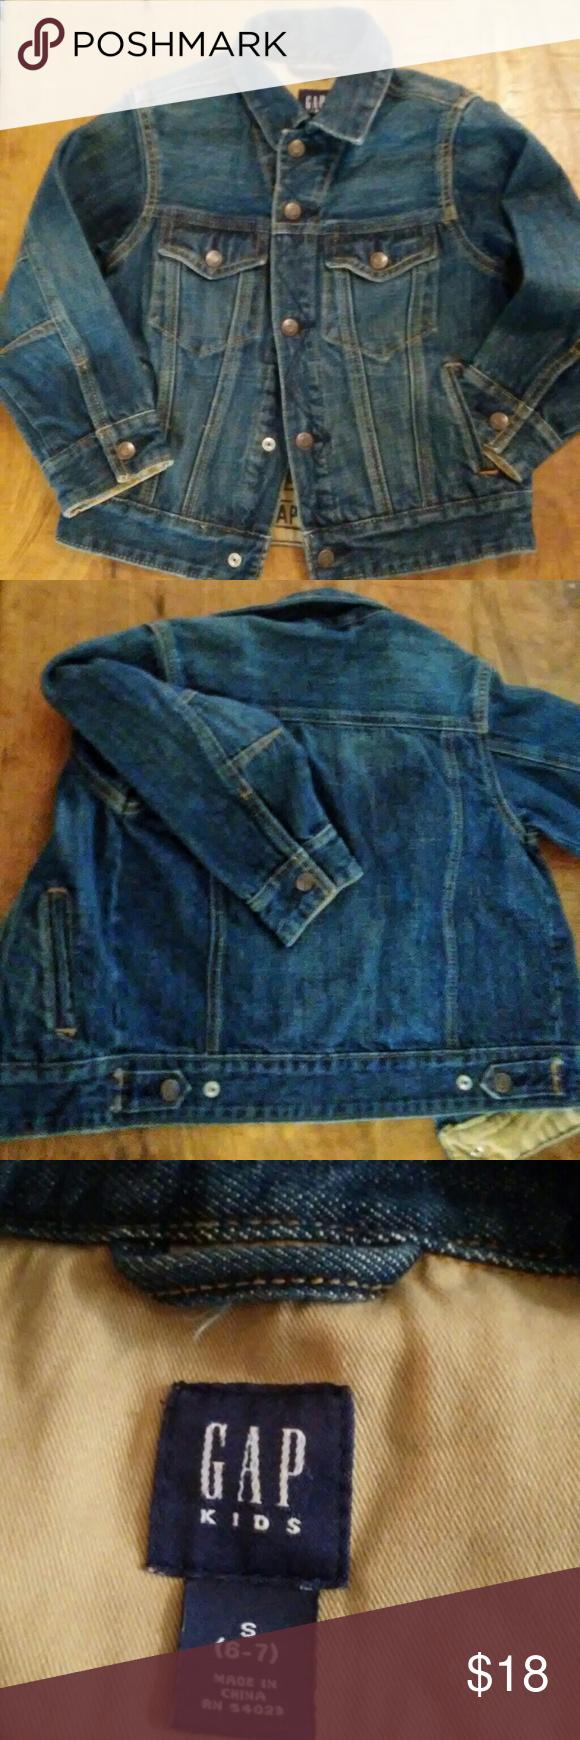 94439d34d600 Kids Gap Denim Jacket 6 7 EUC Boy girl denim jacket Excellent used ...